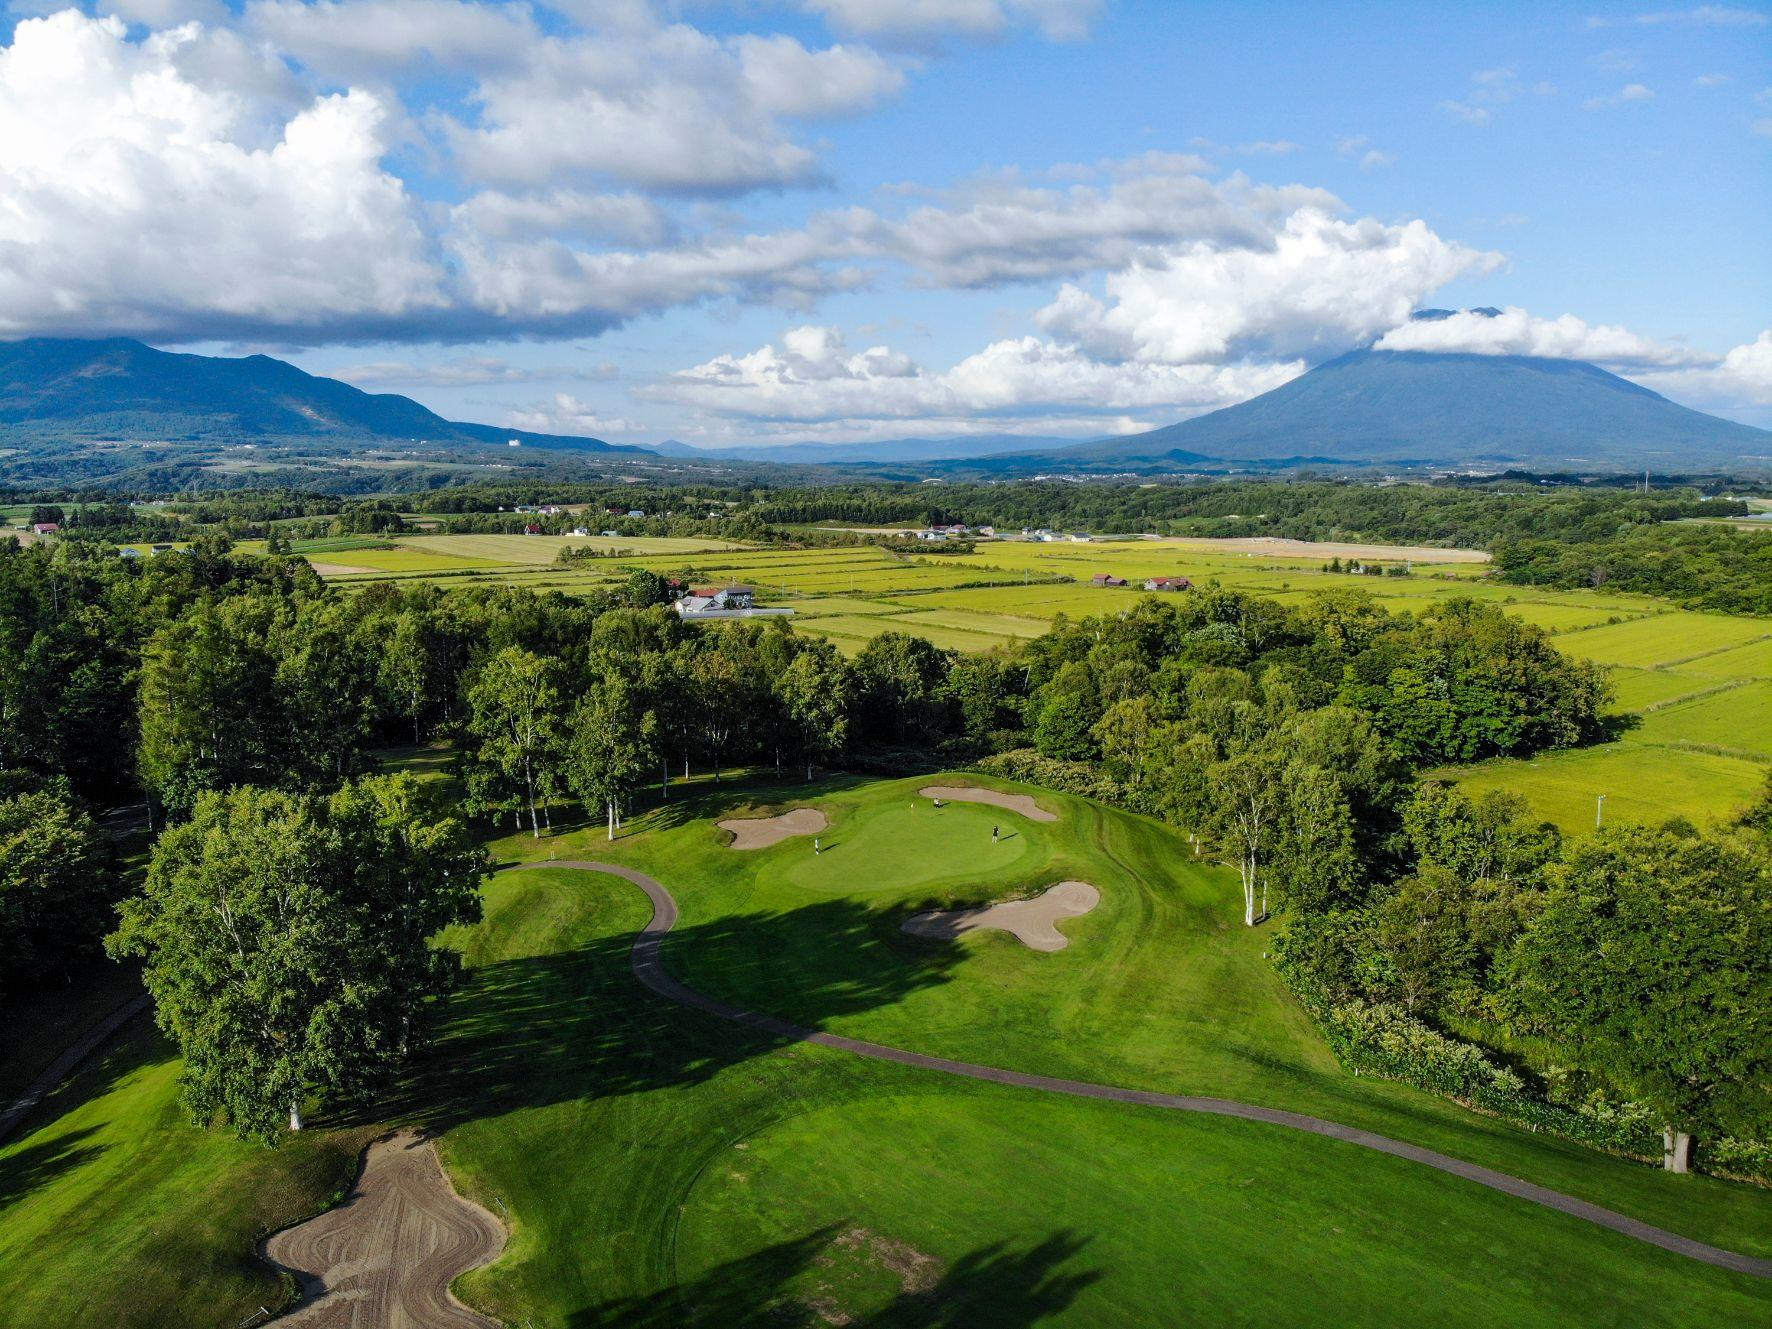 Aerial view of Niseko golf course near Chatrium Niseko Japan